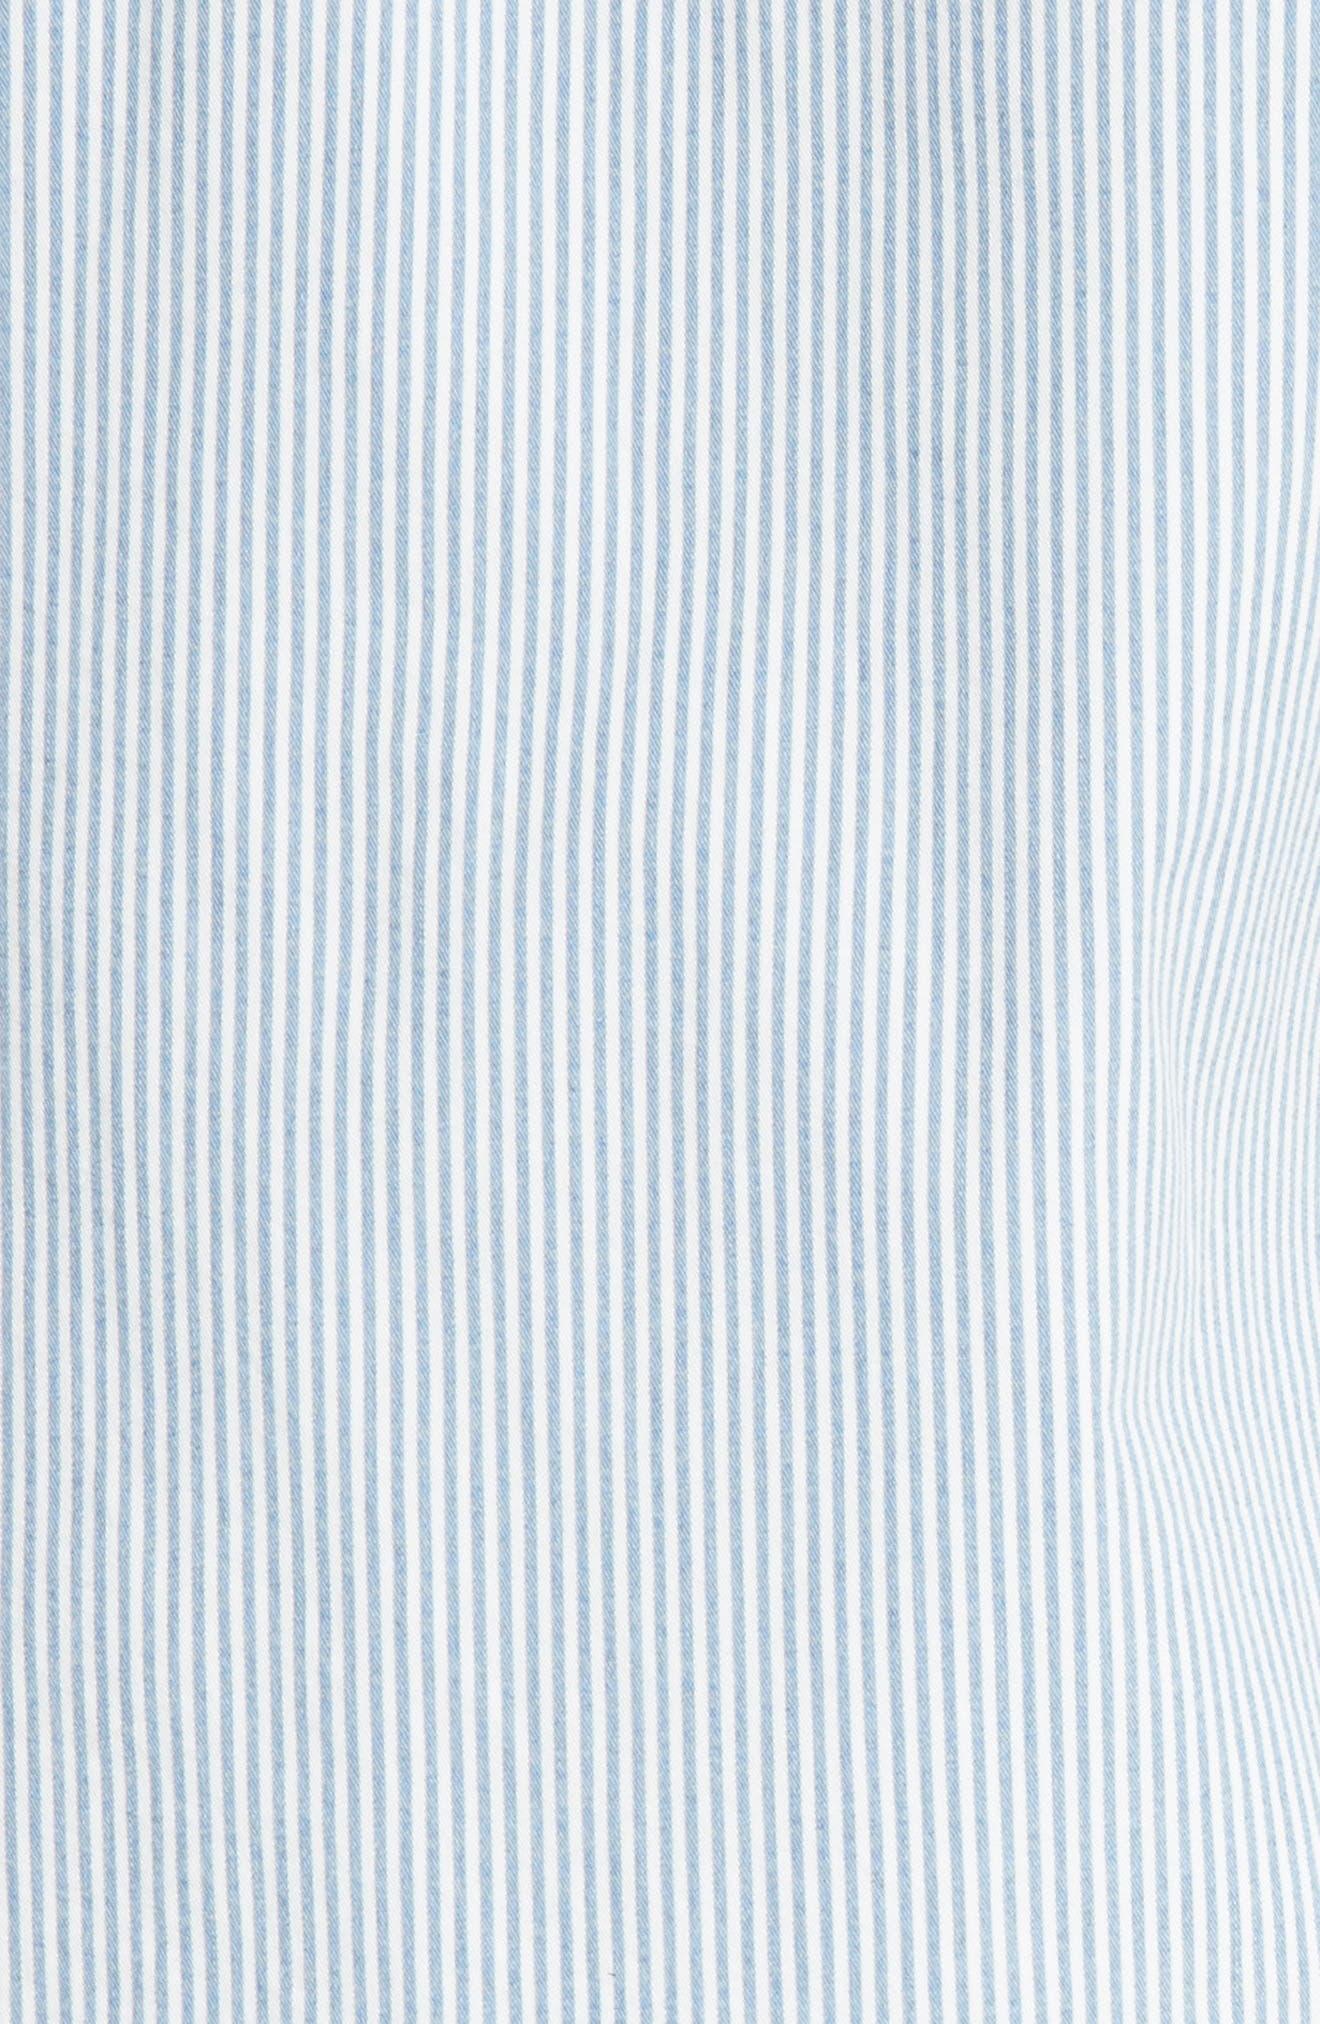 Riga Microstripe Denim Sport Shirt,                             Alternate thumbnail 4, color,                             461